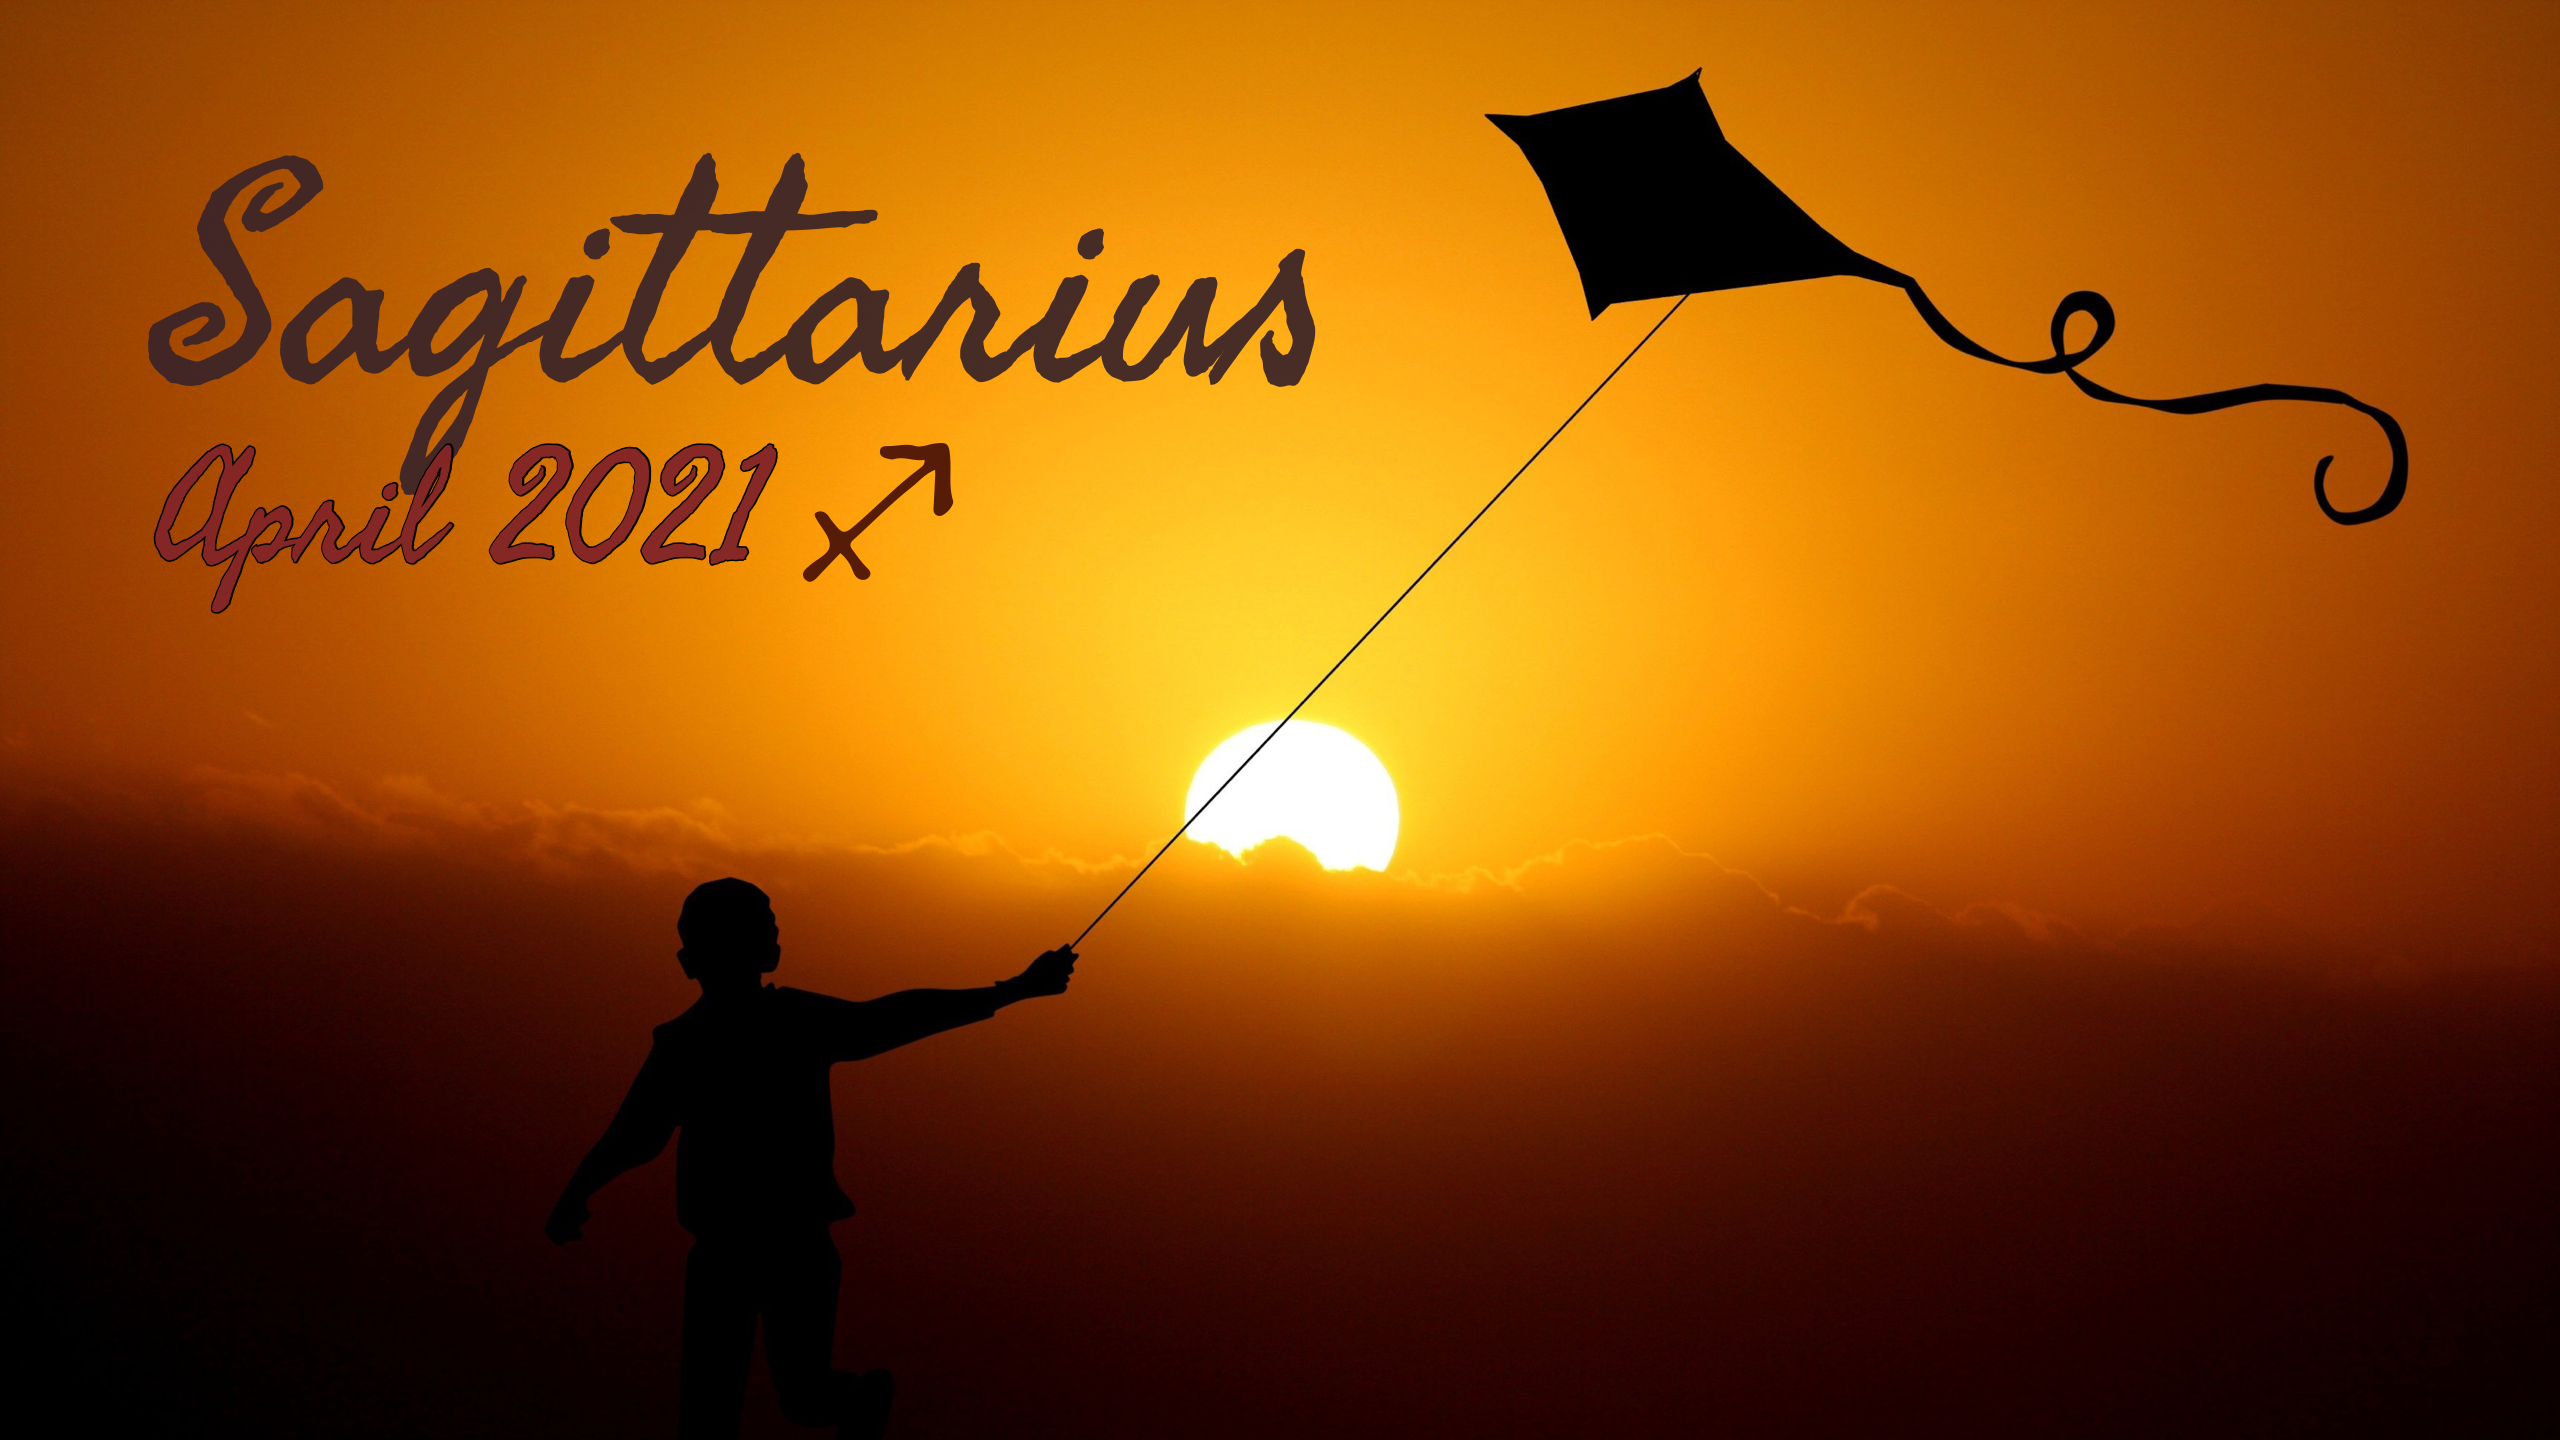 2021 04:Banner:09 Sagittarius